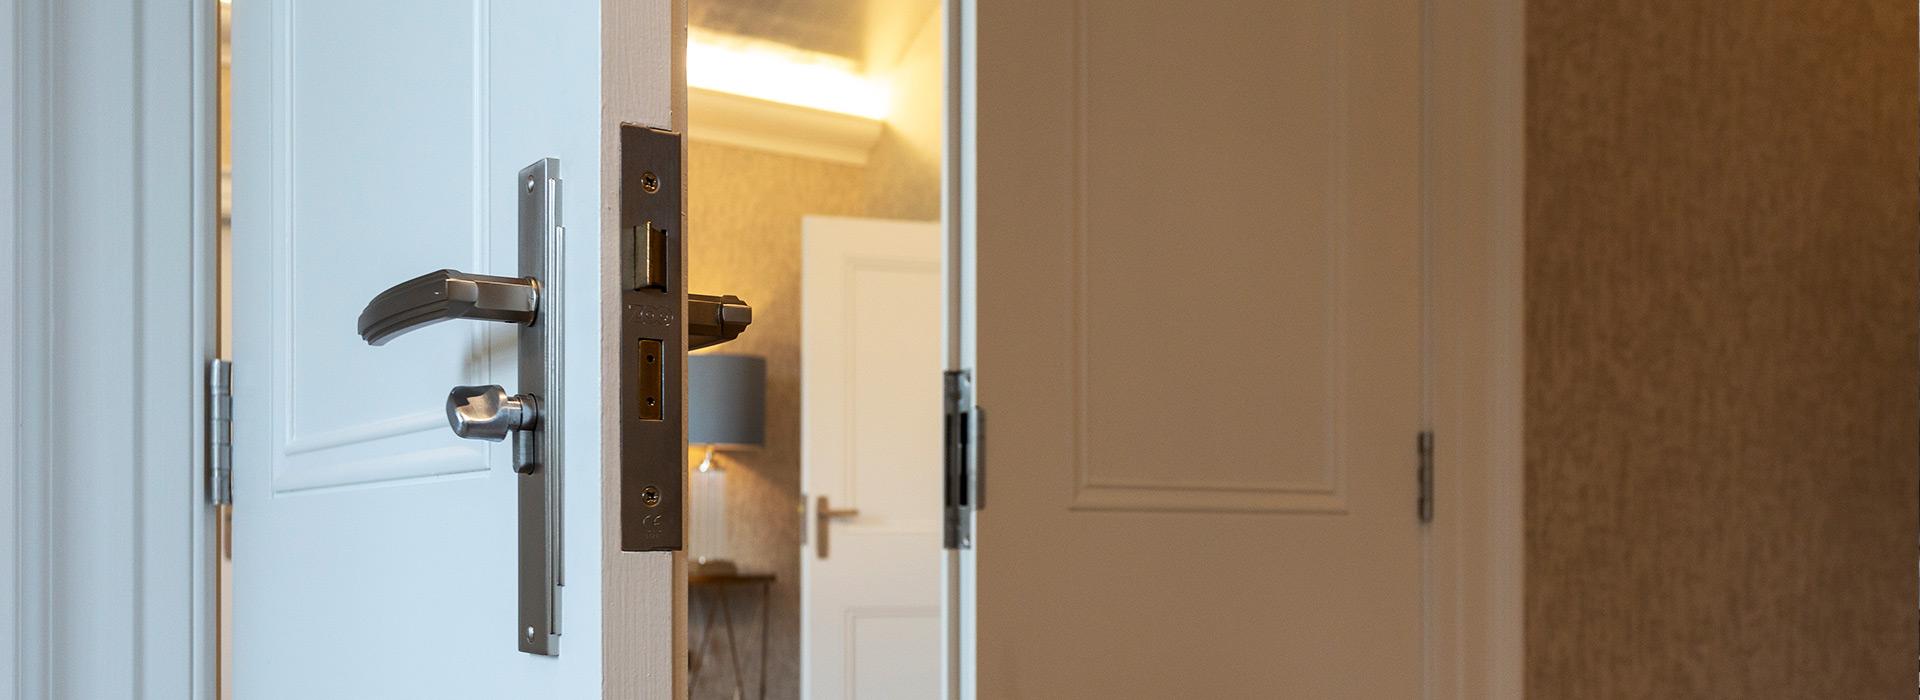 Rebated interior doors